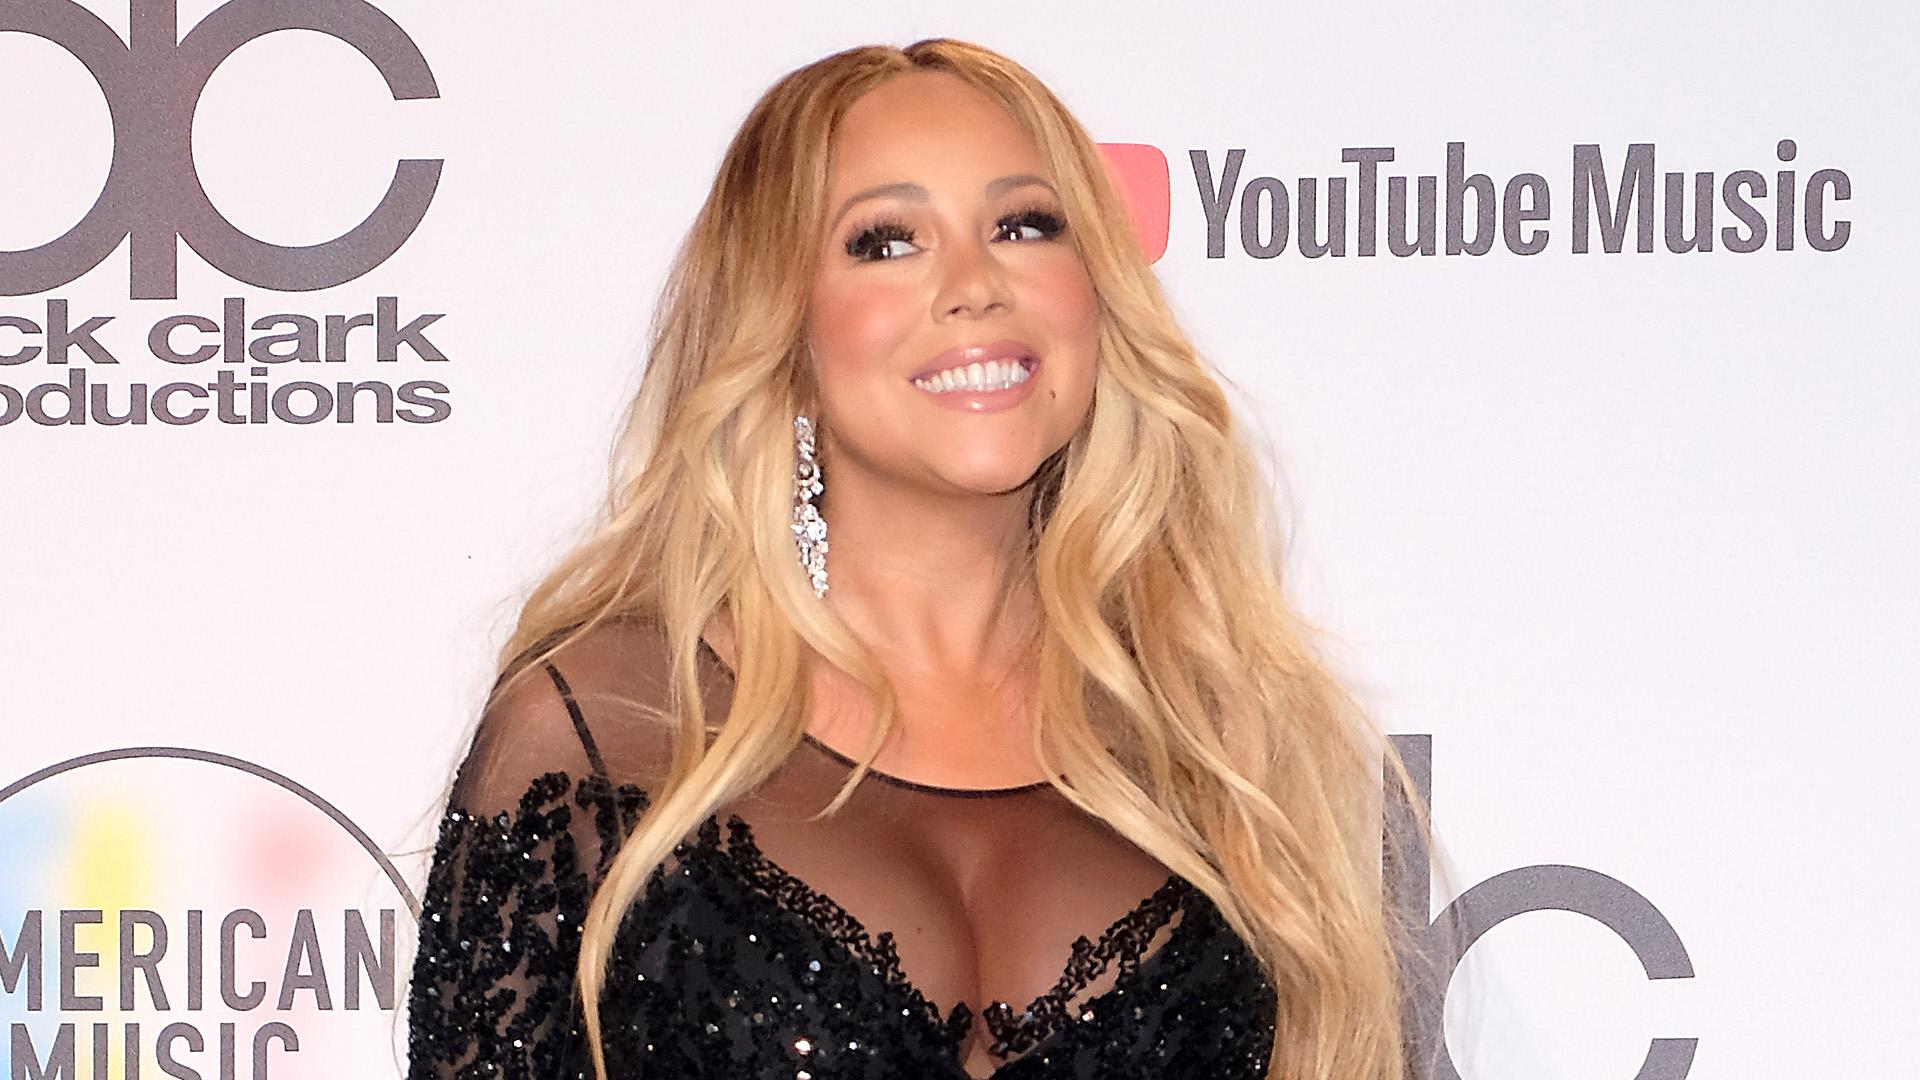 brand new 50973 70124 181015 3812746 Mariah Carey Shares Big Album News With The  anvver 1.jpg